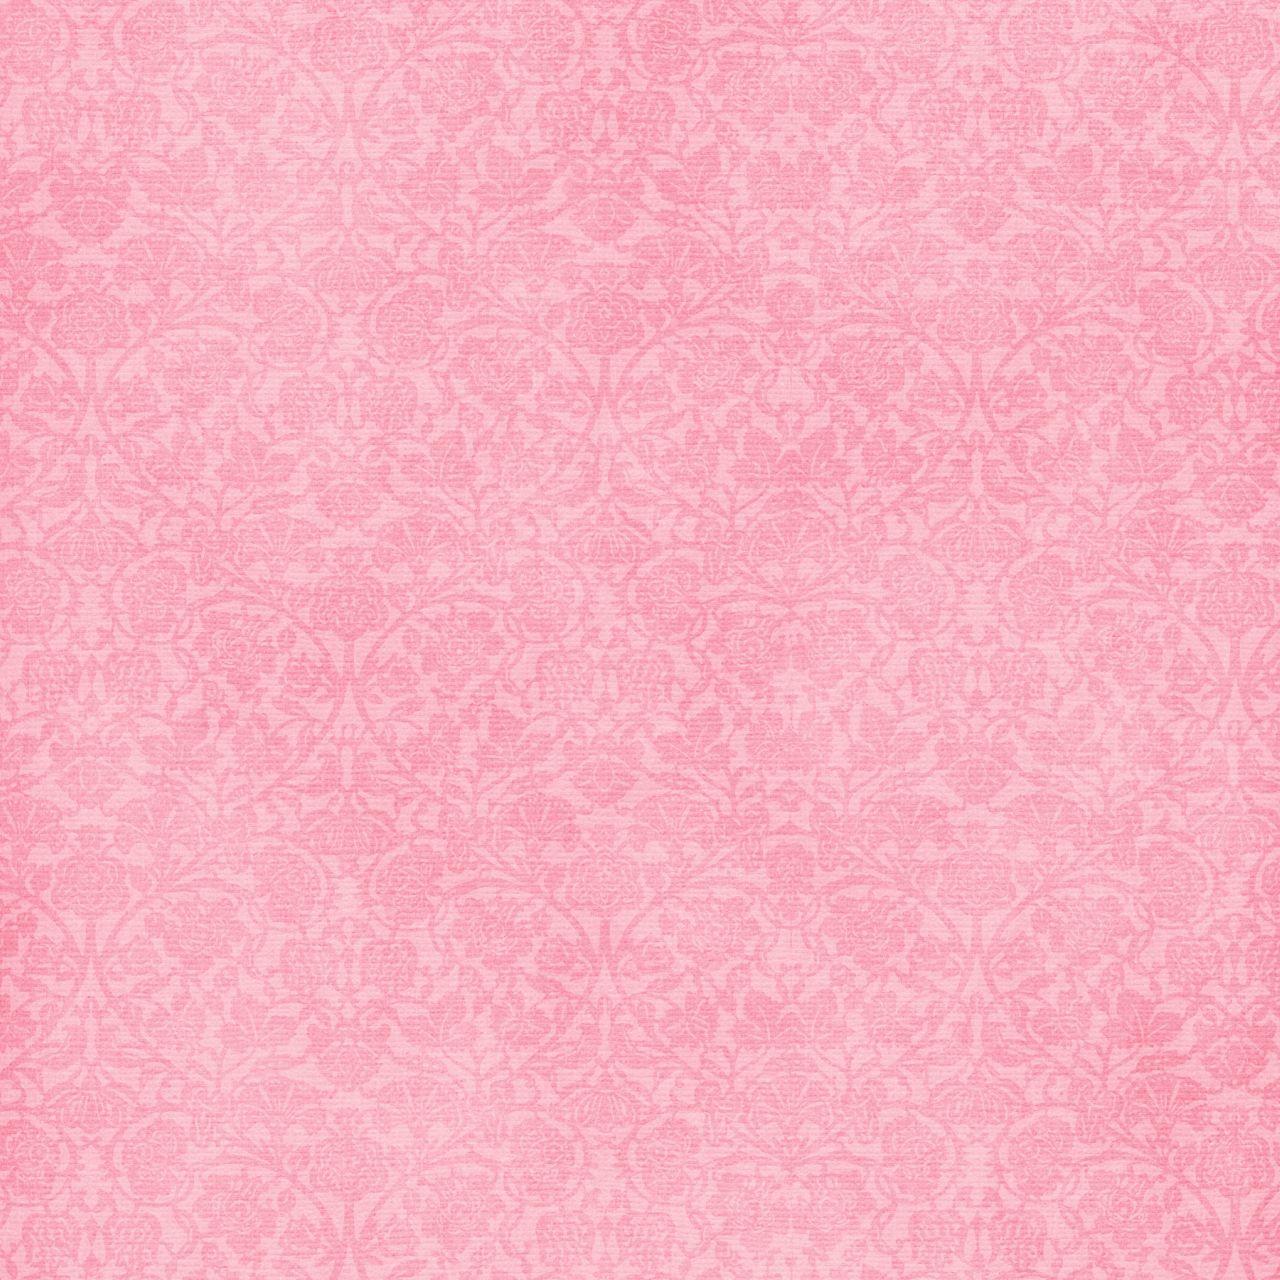 Digital Papers Scrapbooking Pink Love Vintage Paper Scrapbook Backgrounds Minnie Rosa Clip Art Velvet